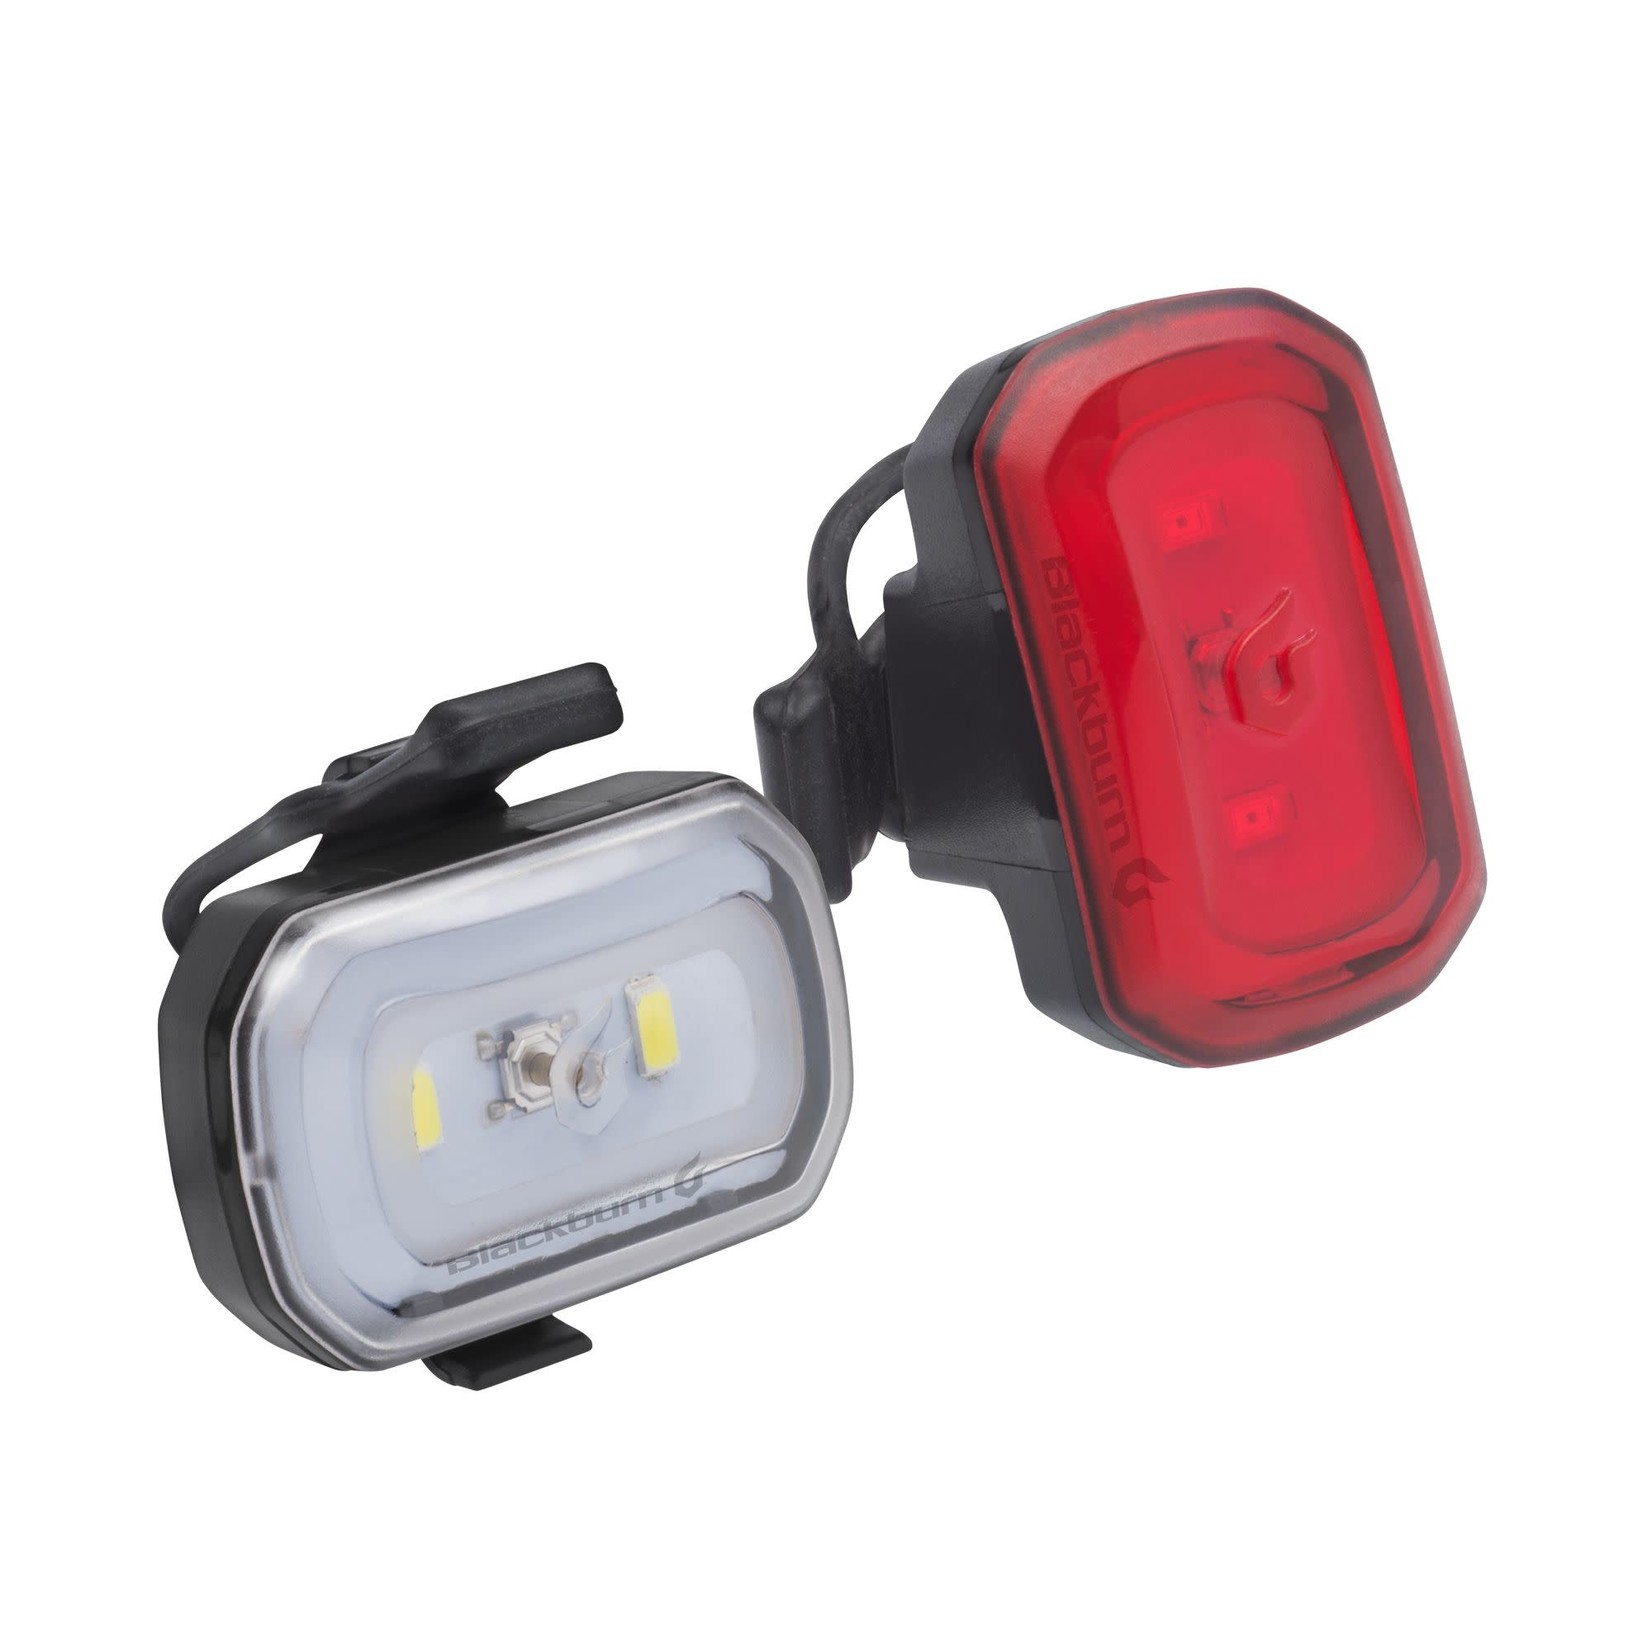 USB Click Light Combo Set